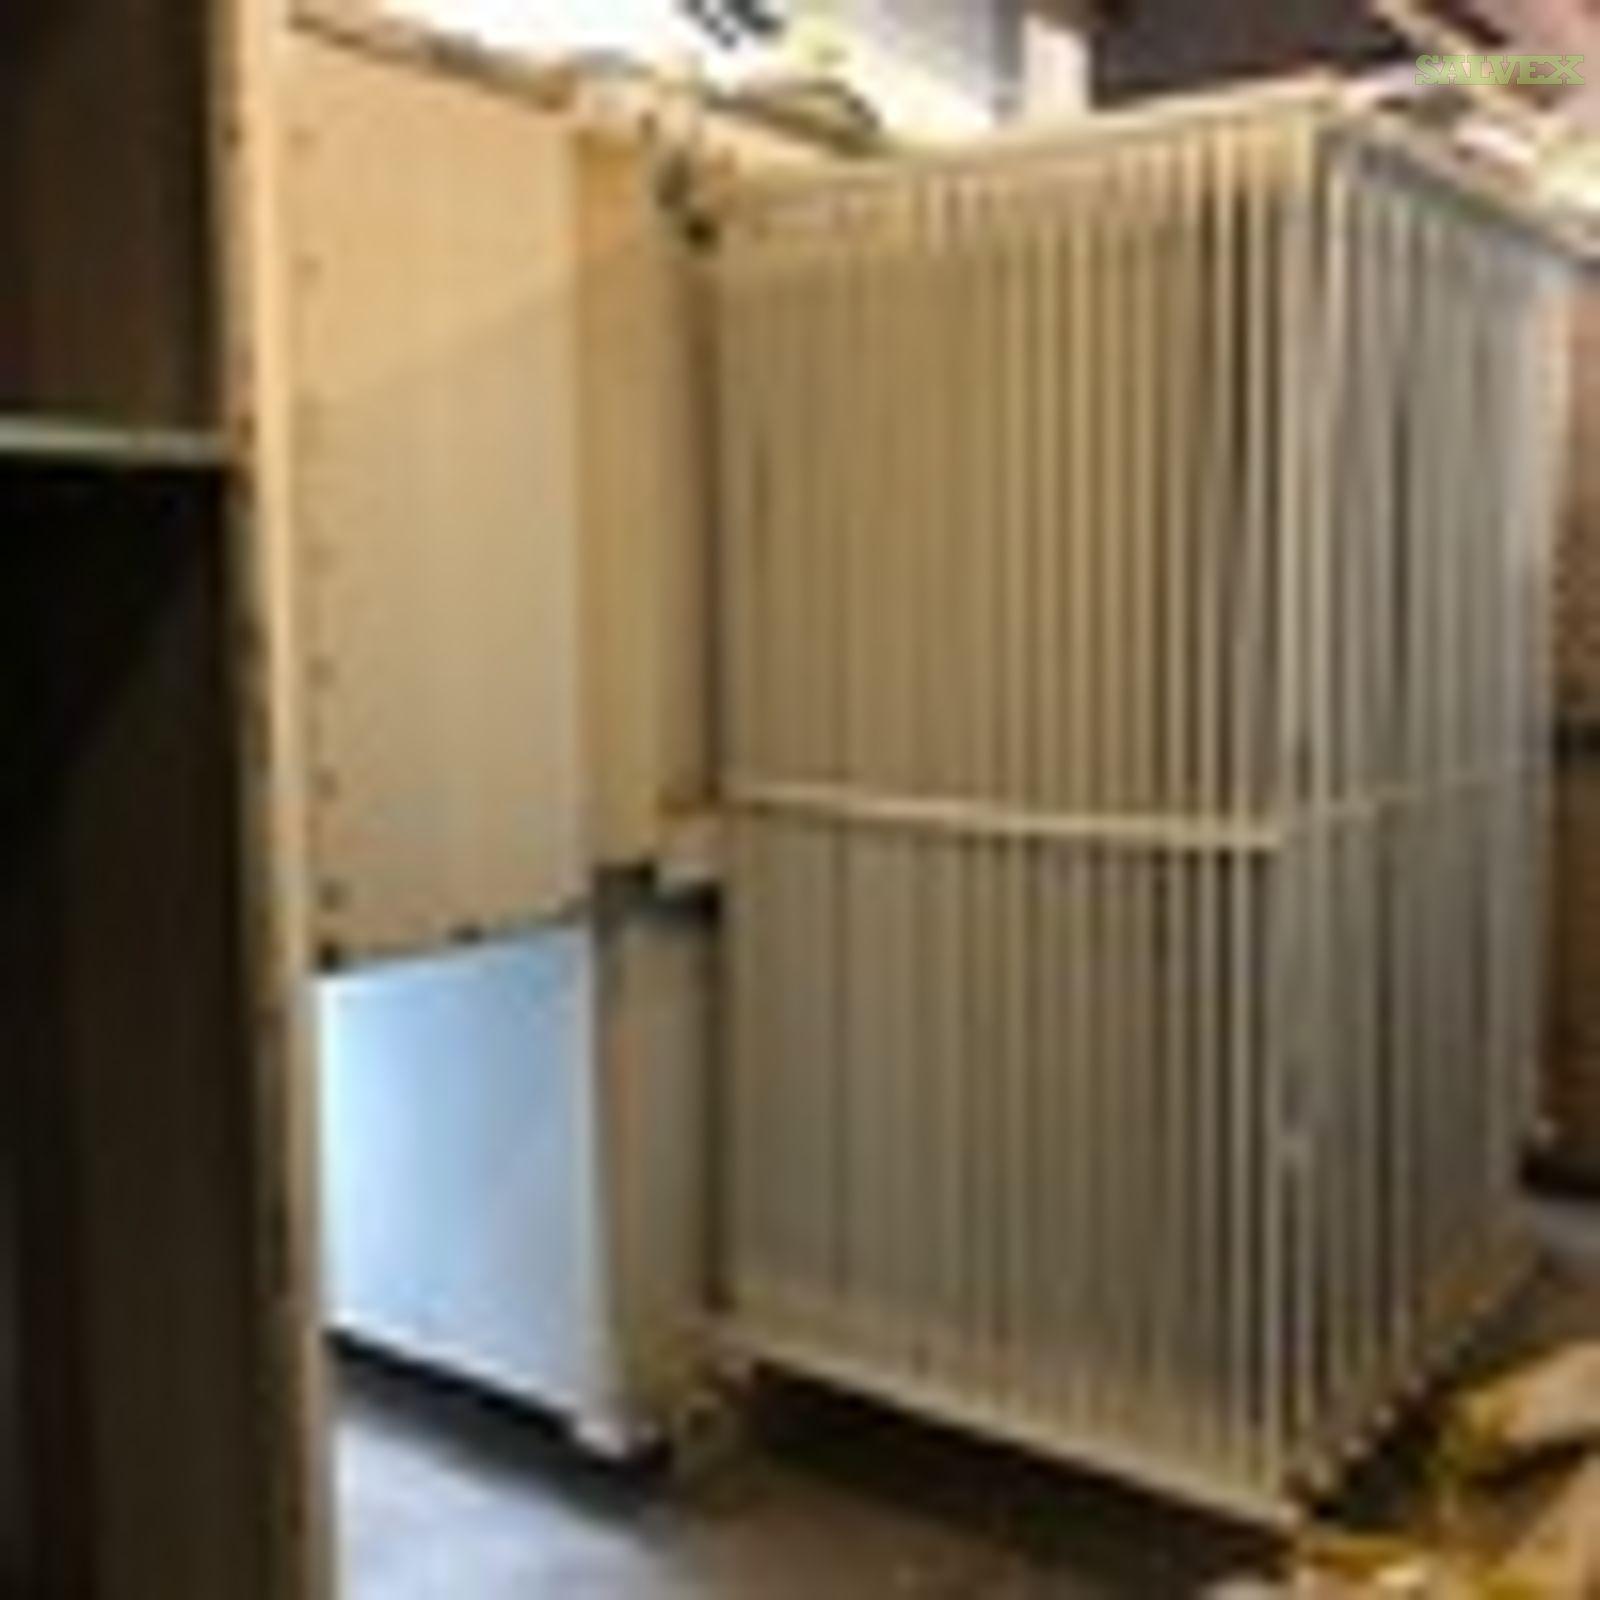 5000kVA ABB Transformer 60Hz, 3phase, HV13200, LV 13200Y / 7620